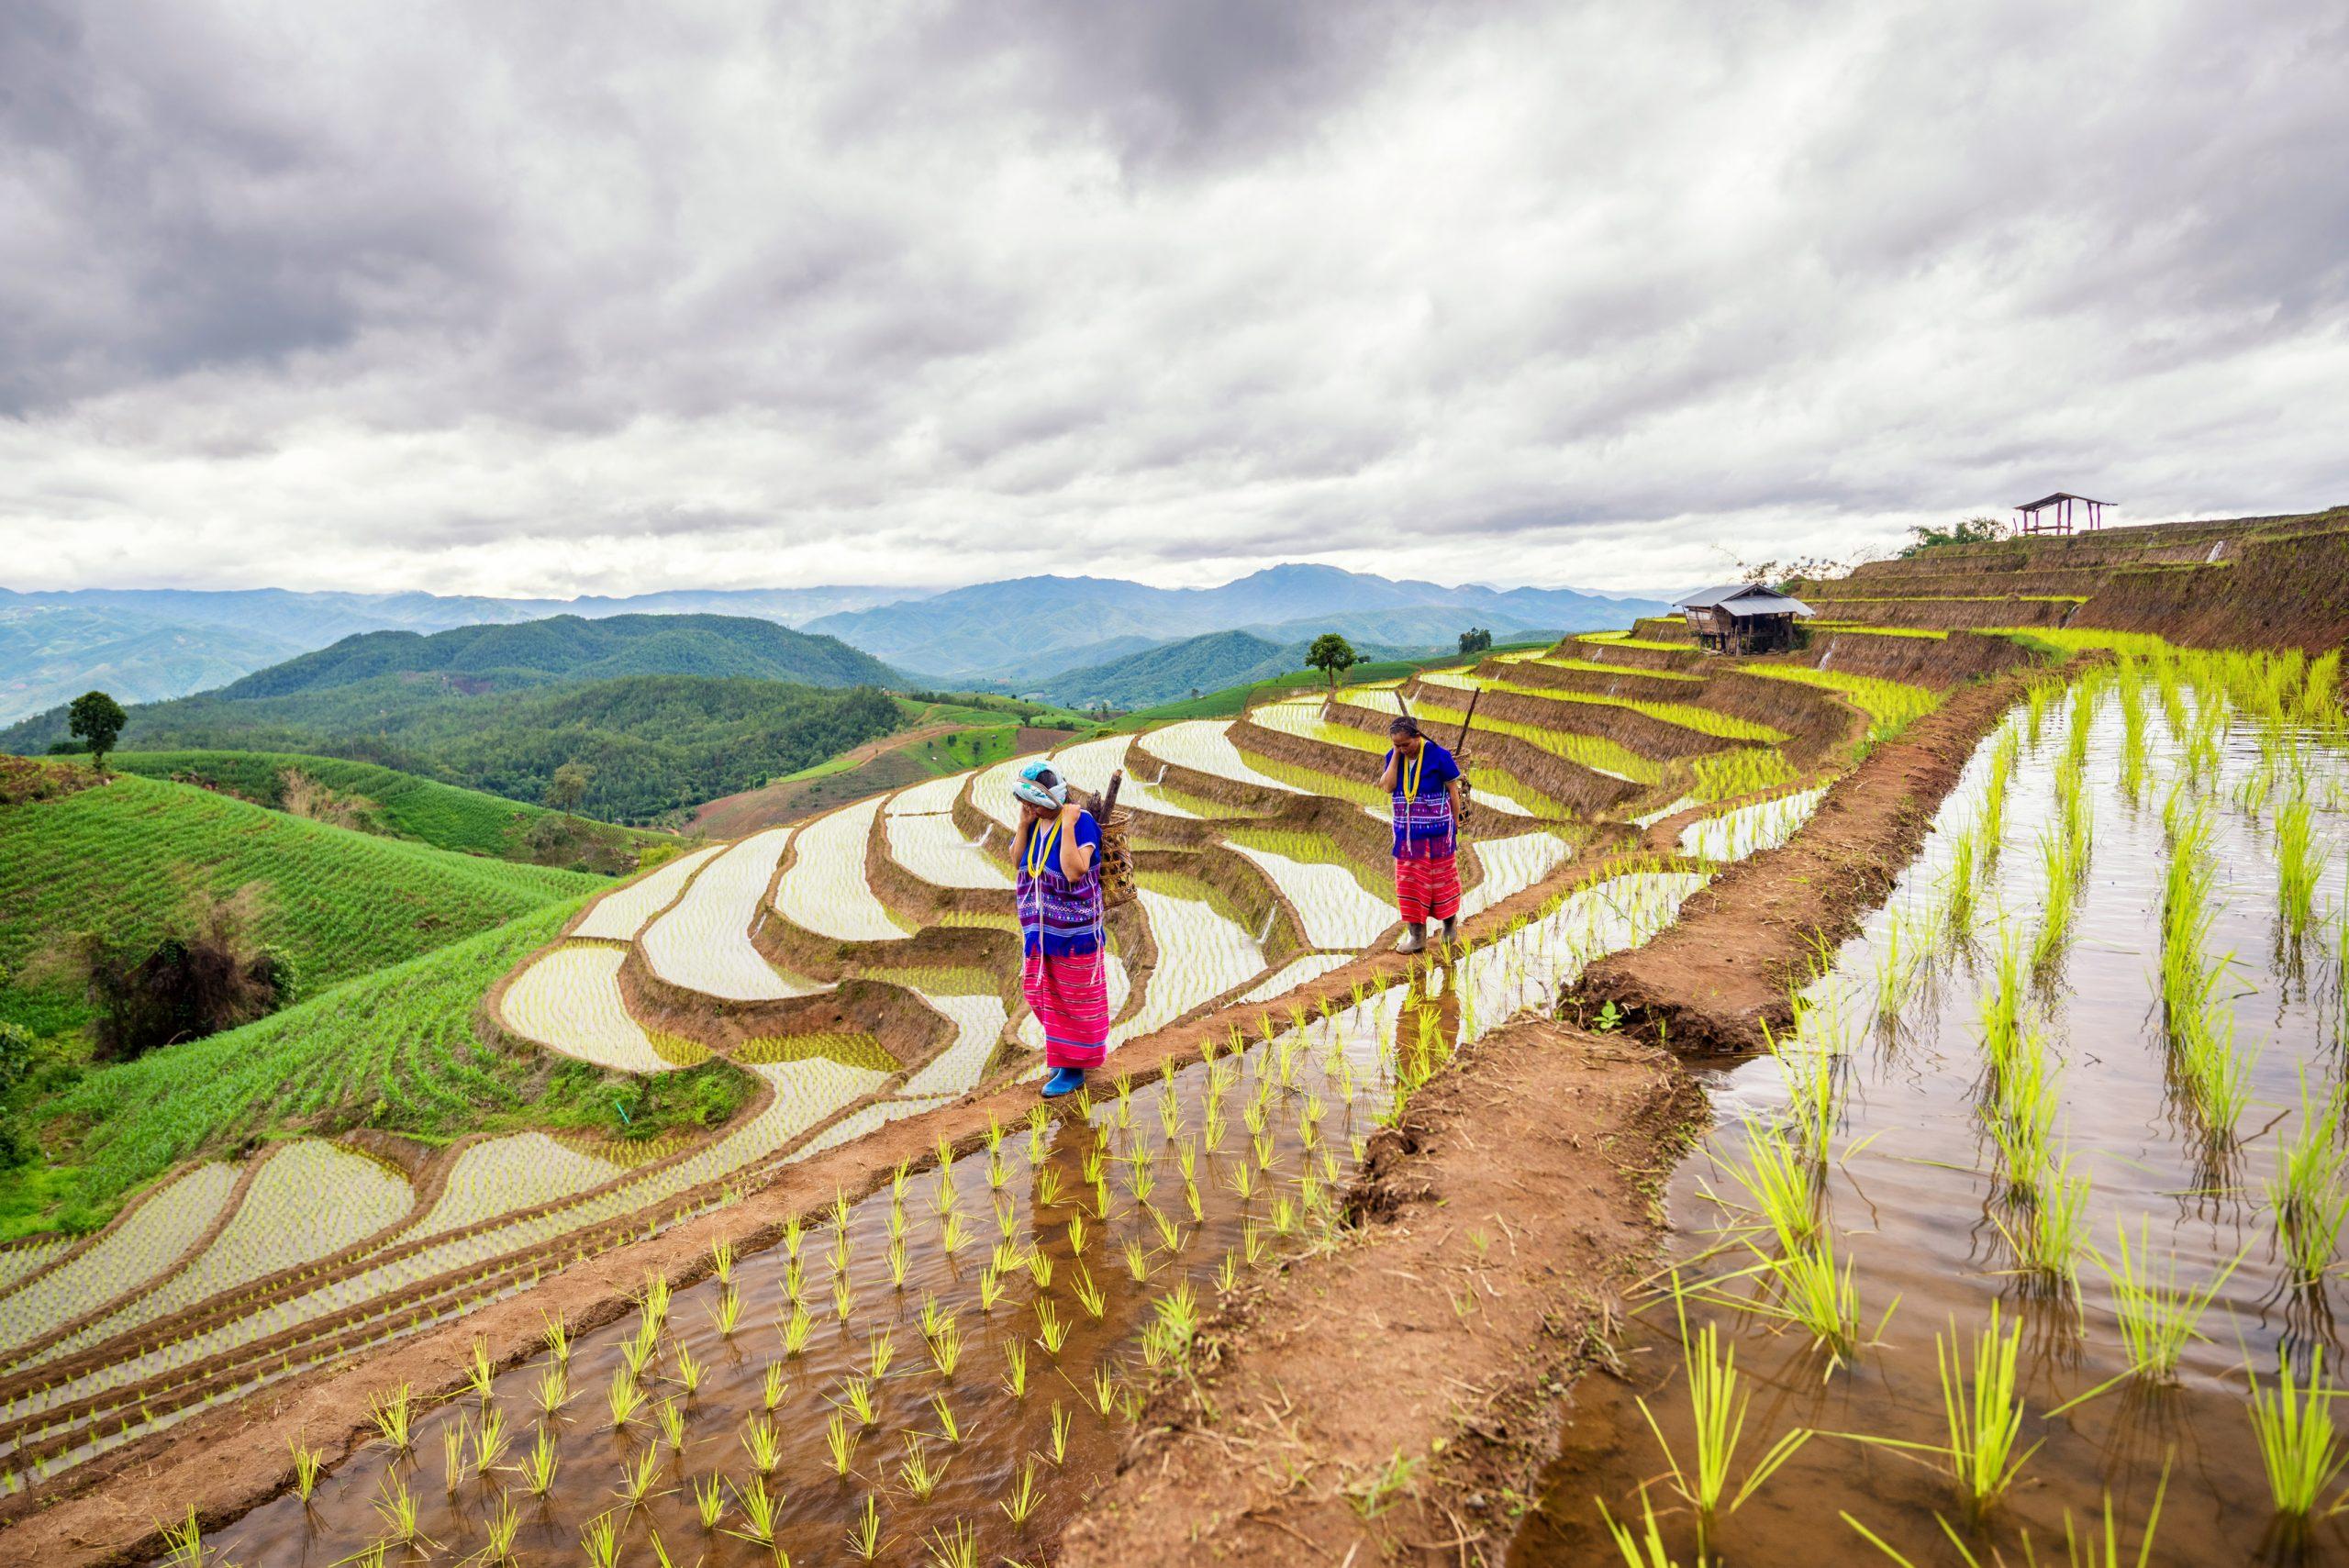 GFFA 2017: Agriculture and Water - Key to Feeding the World | Photo: © martinhosmat083 / Fotolia